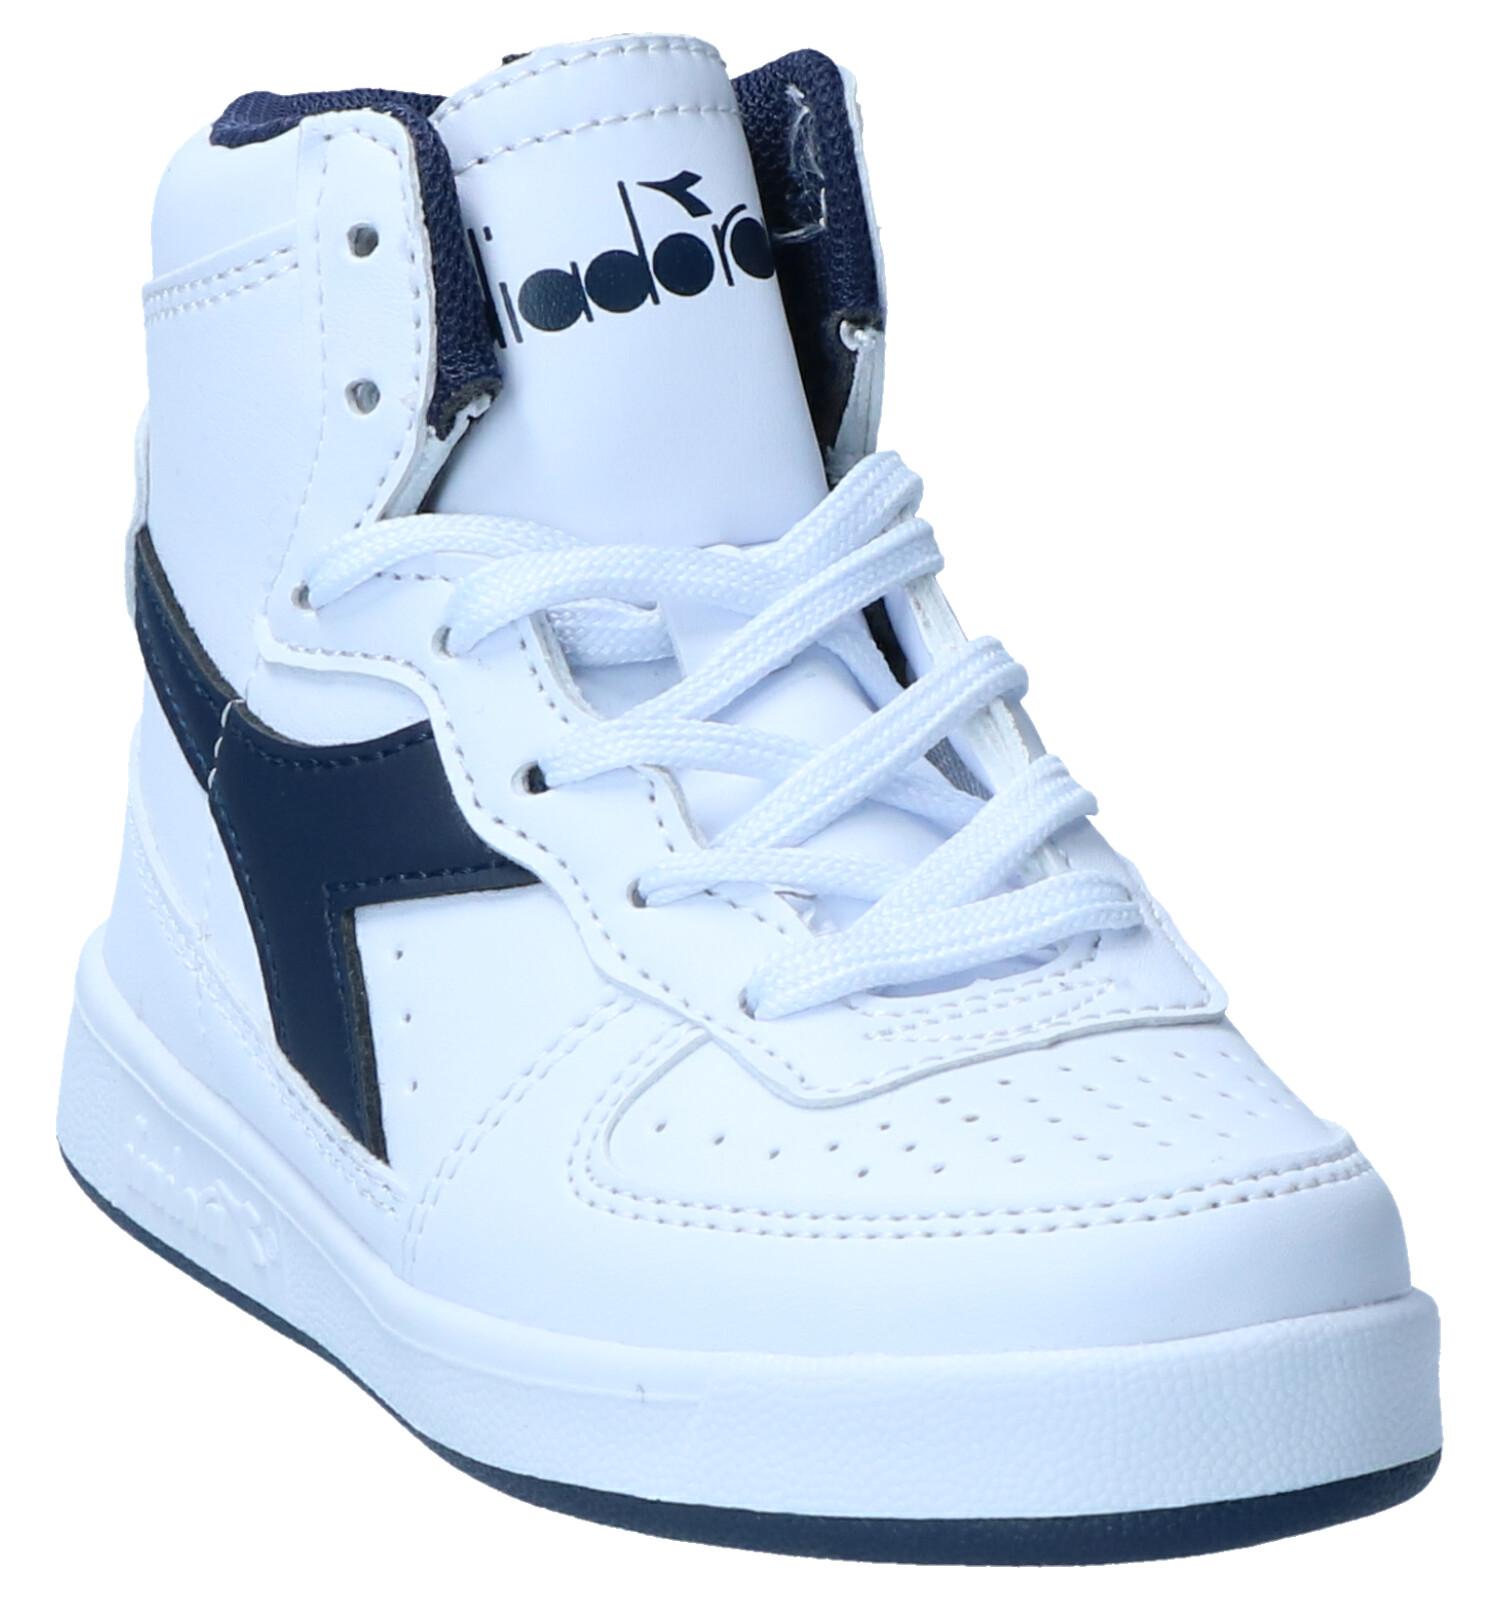 Diadora Mi Basket Witte Sneakers | TORFS.BE | Gratis verzend